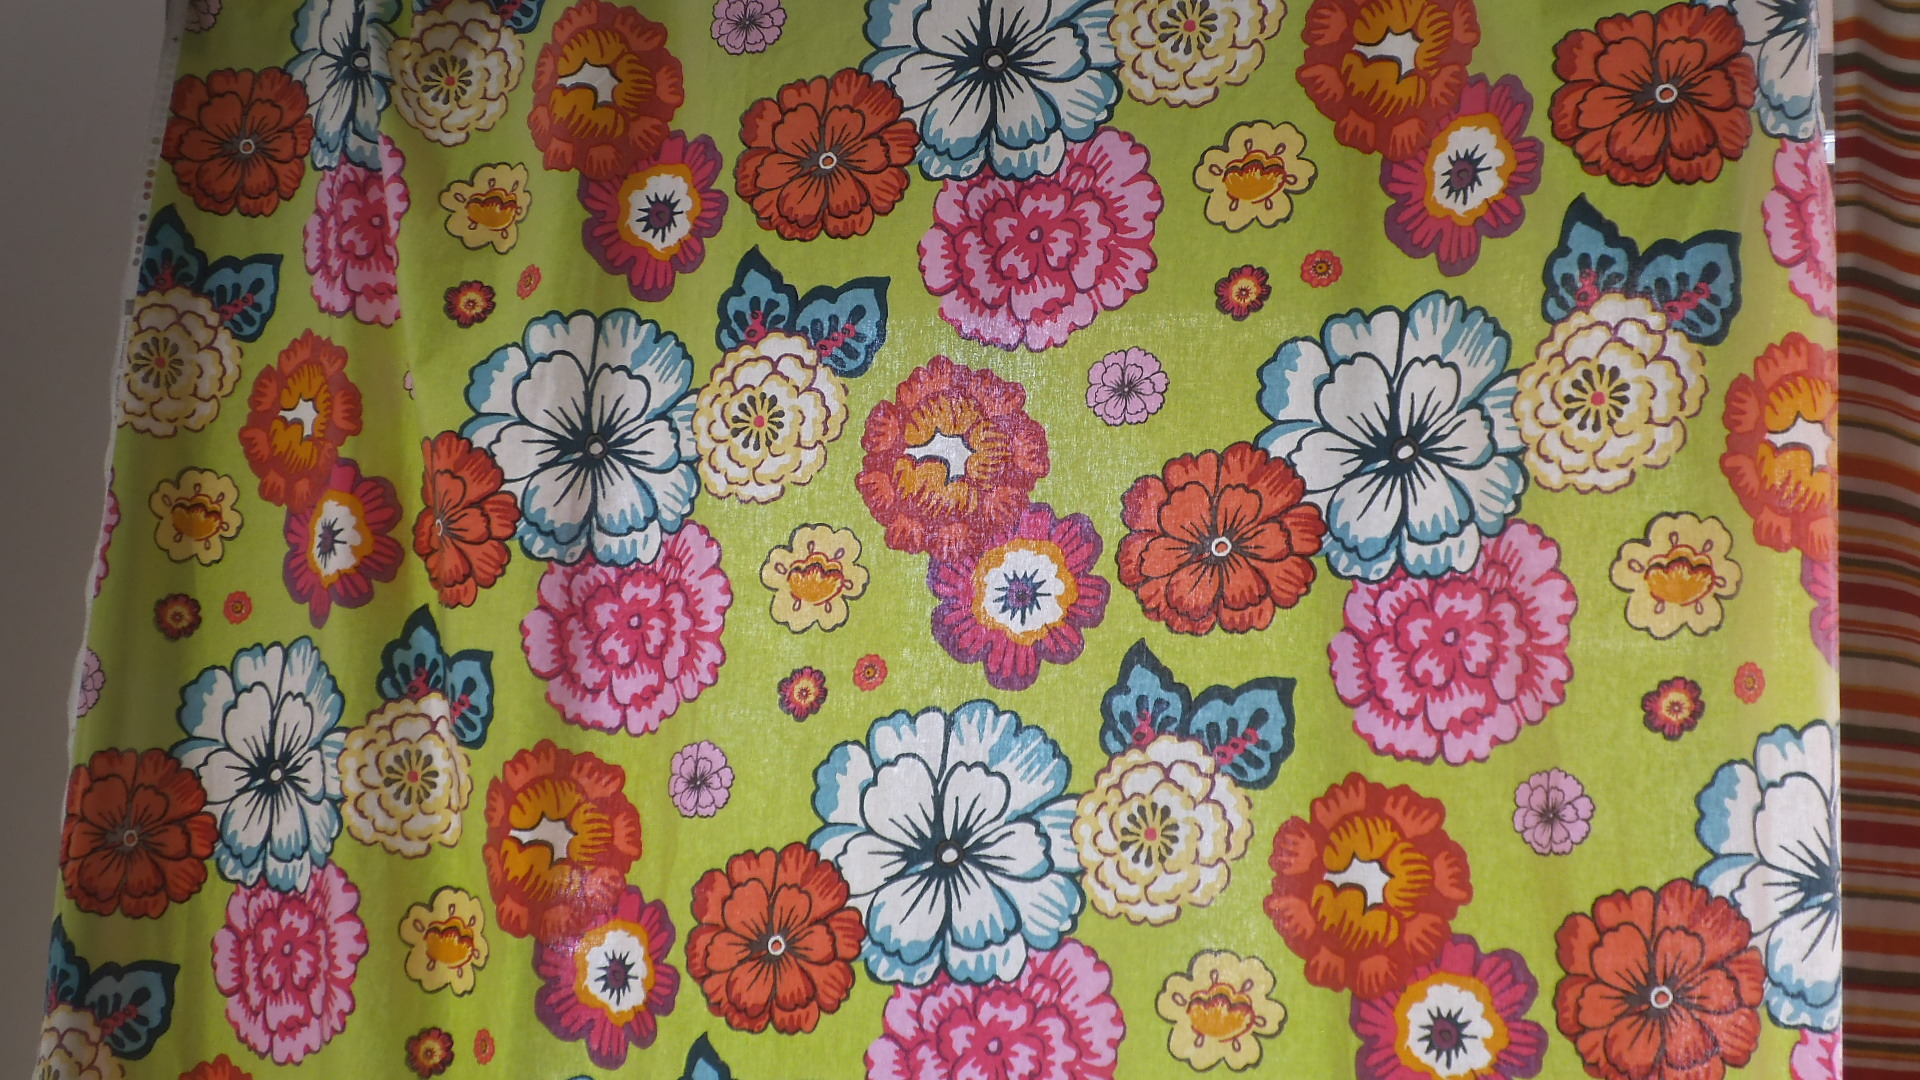 dscf5096 Quel bel giardino estivo: tessuti per esterno.